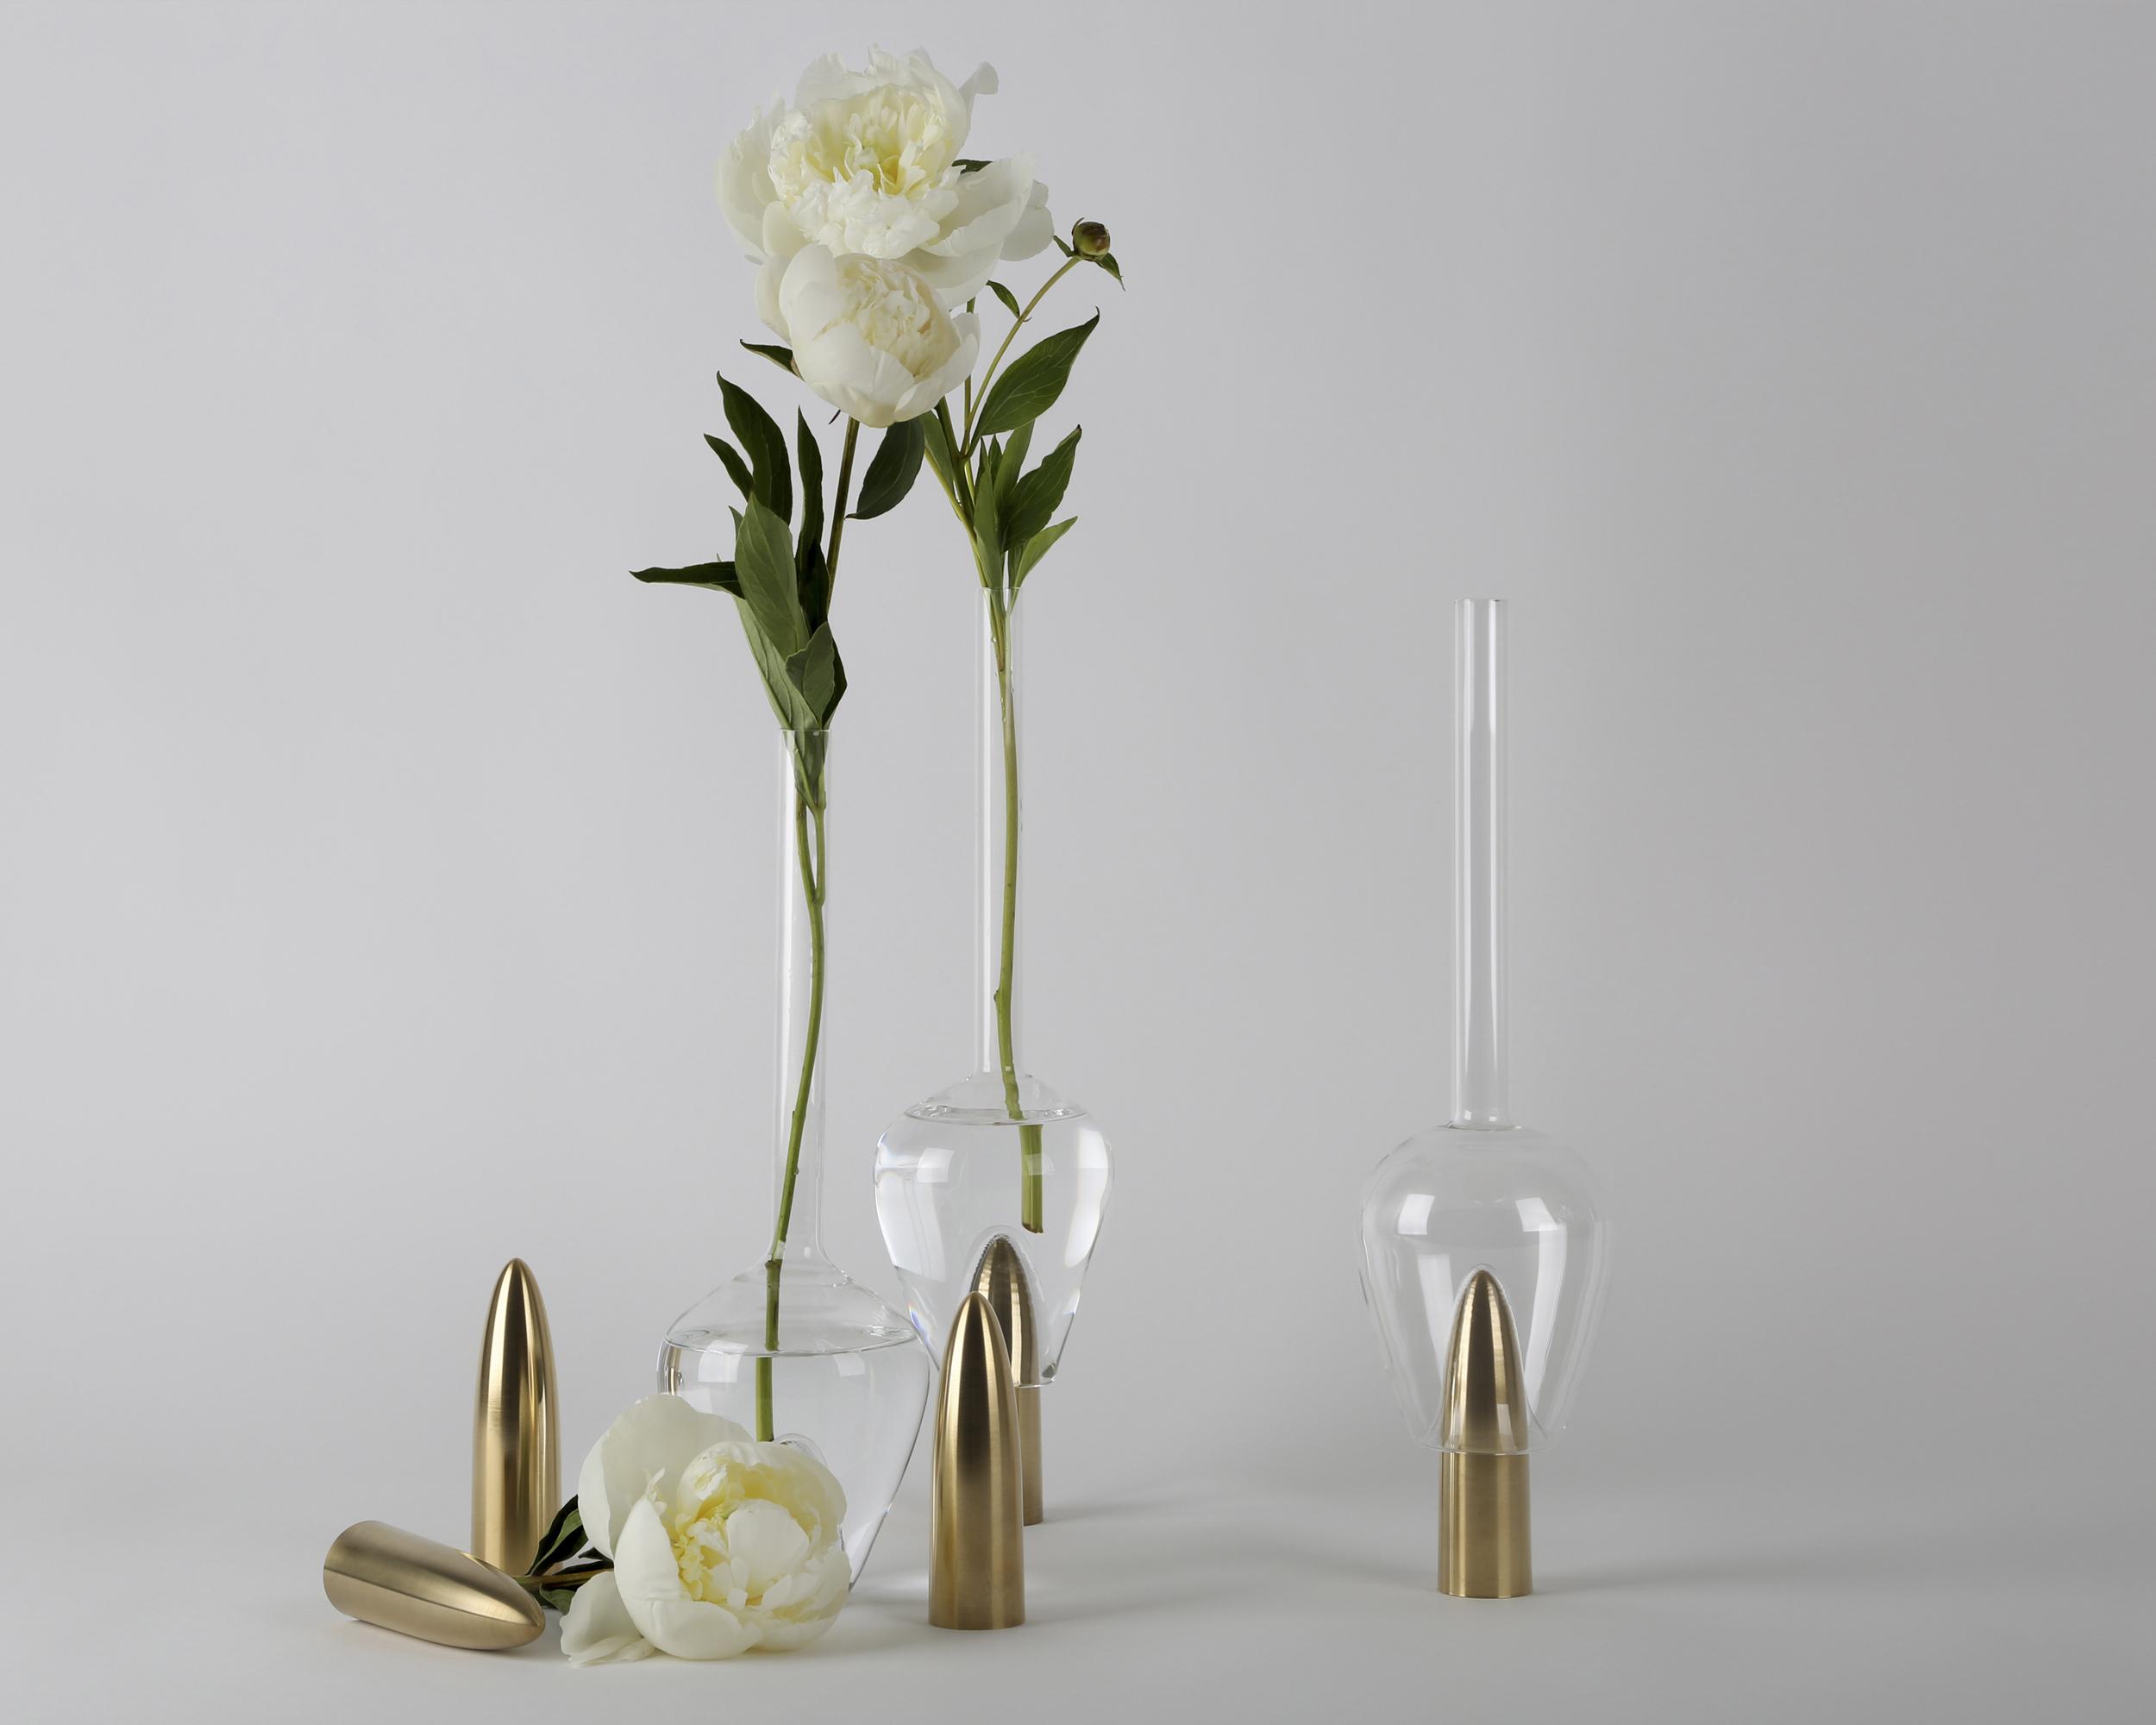 Plugged-Vase-2-Richard-Yasmine-Design-Savannah-Bay-Gallery